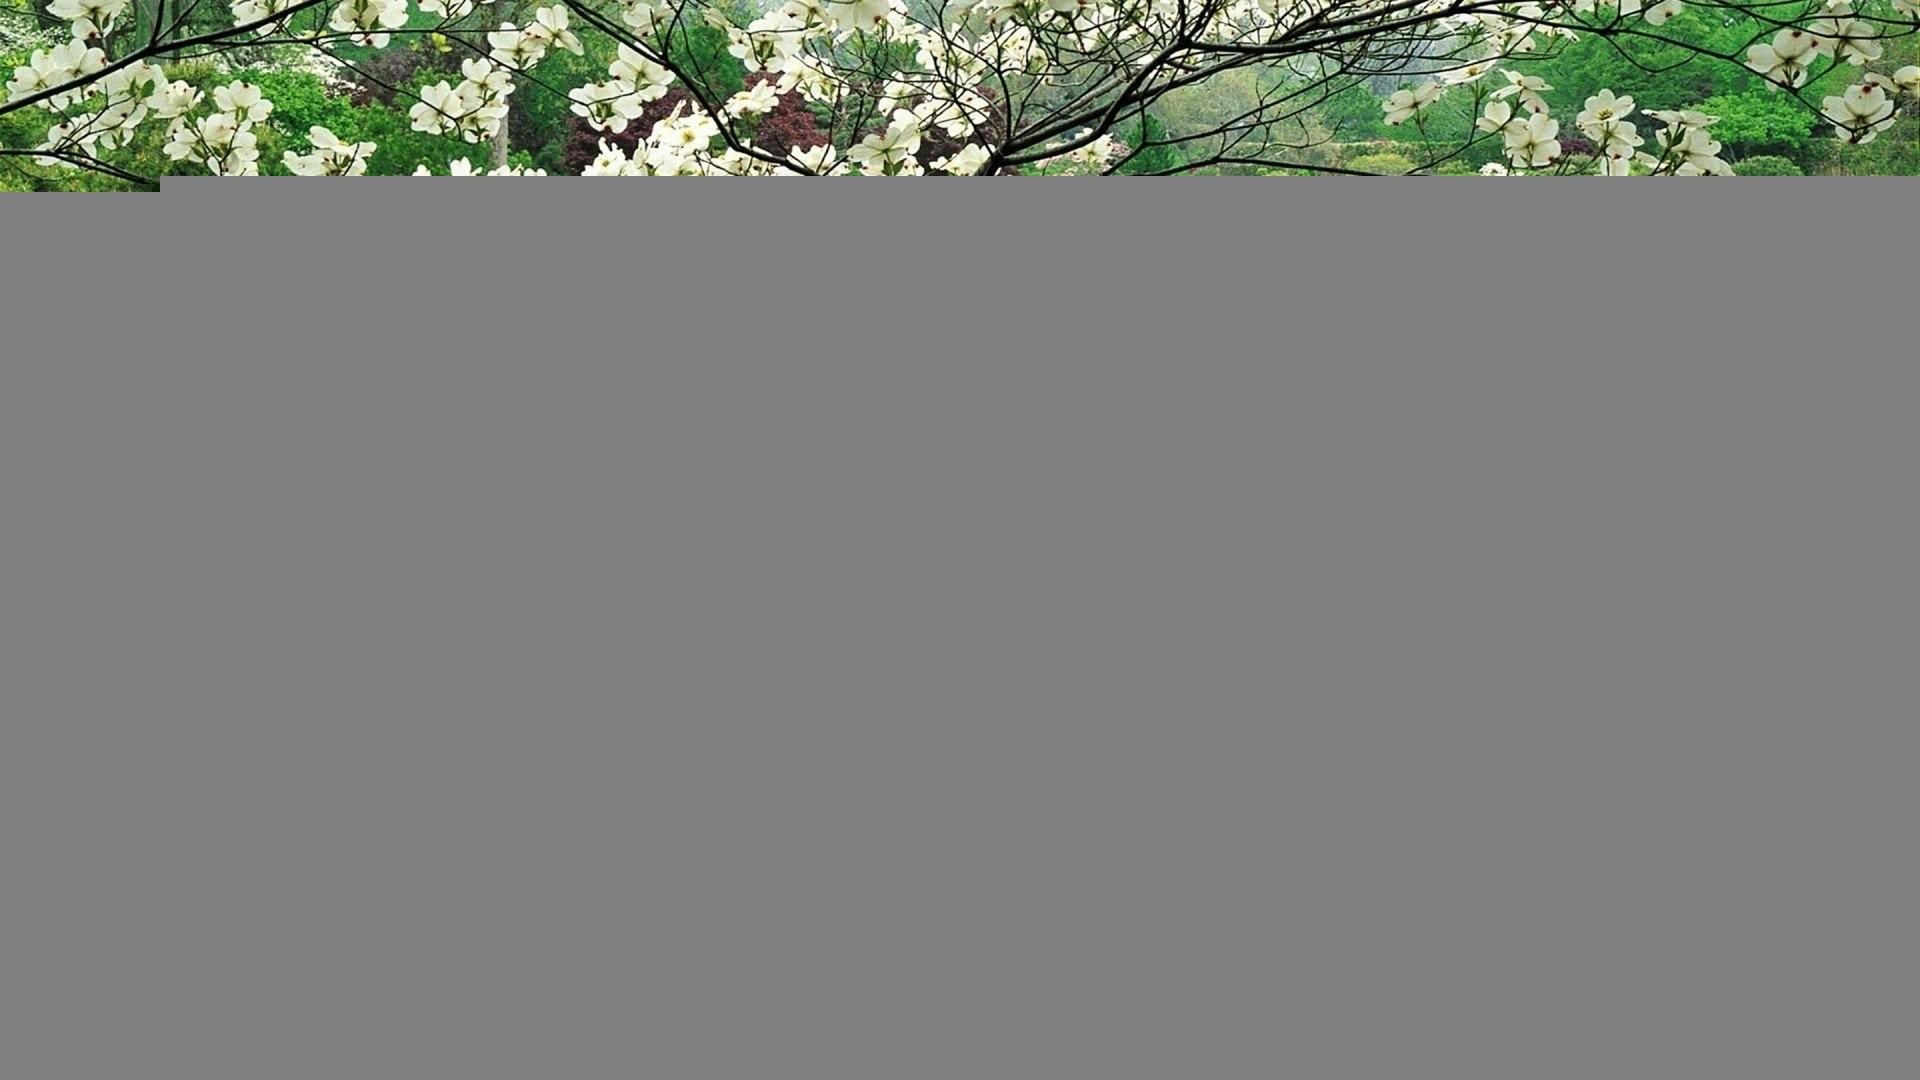 Res: 1920x1080, Japanese Garden Wallpaper